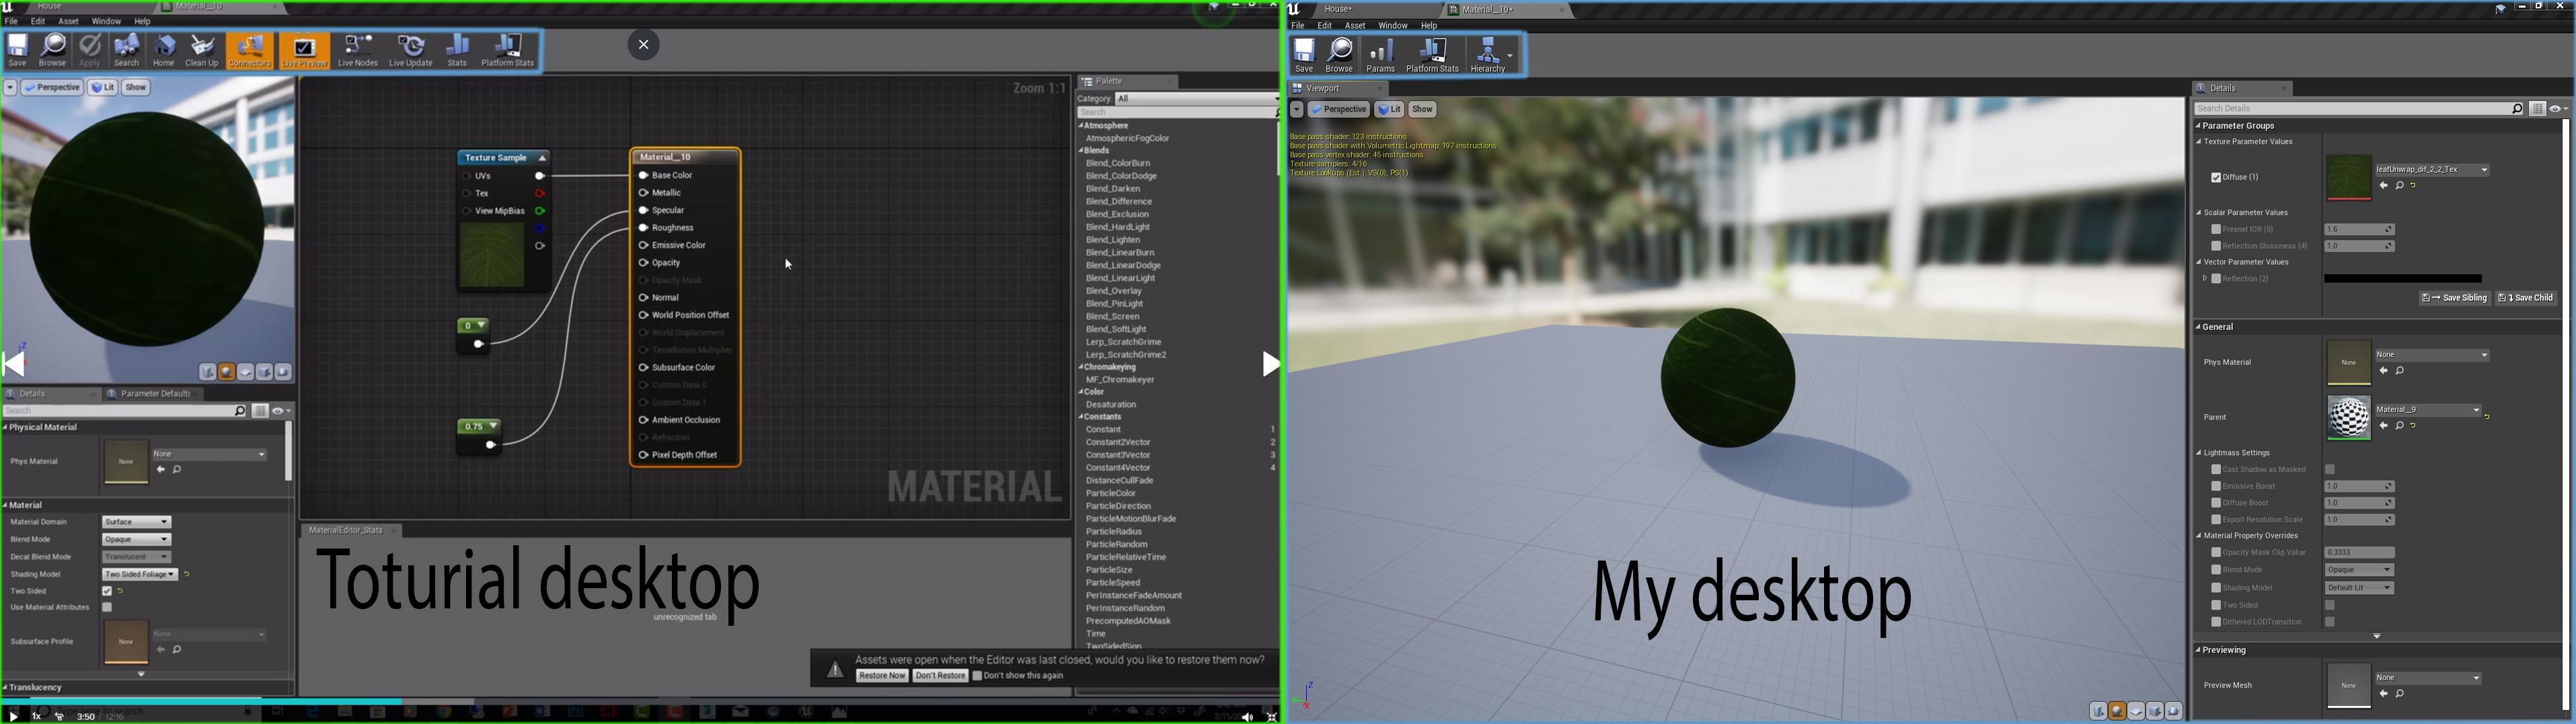 UE4: An Advanced Real Time Arch Viz Project | Adam Zollinger